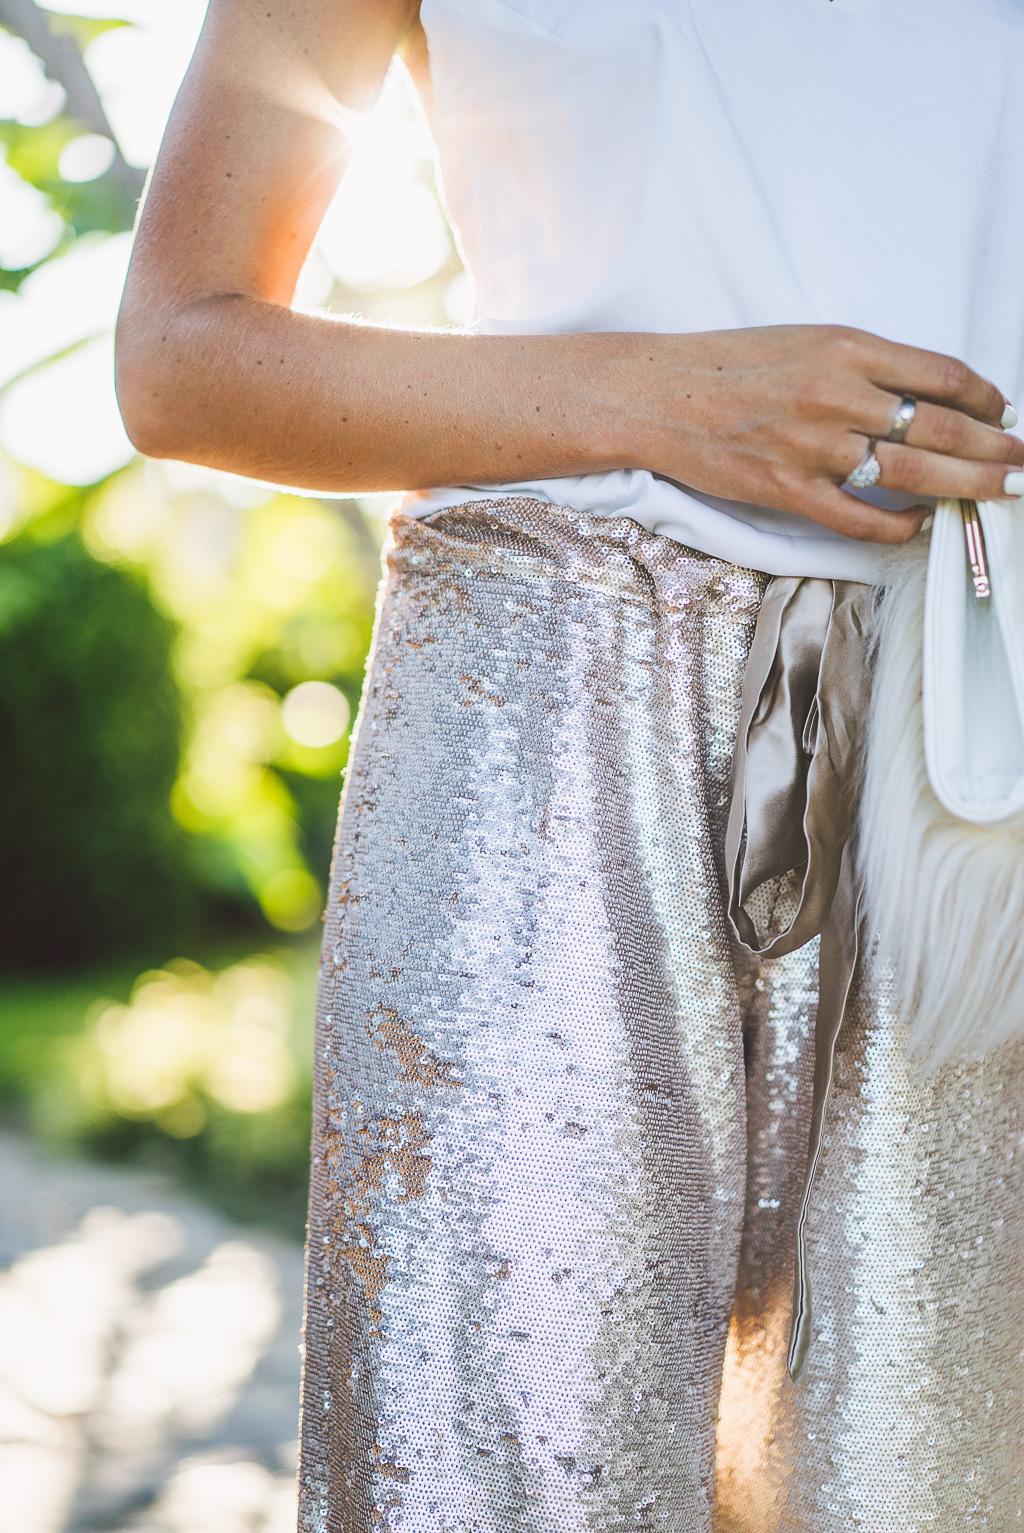 janni-deler-shiny-trousers-bymalinasDSC03663